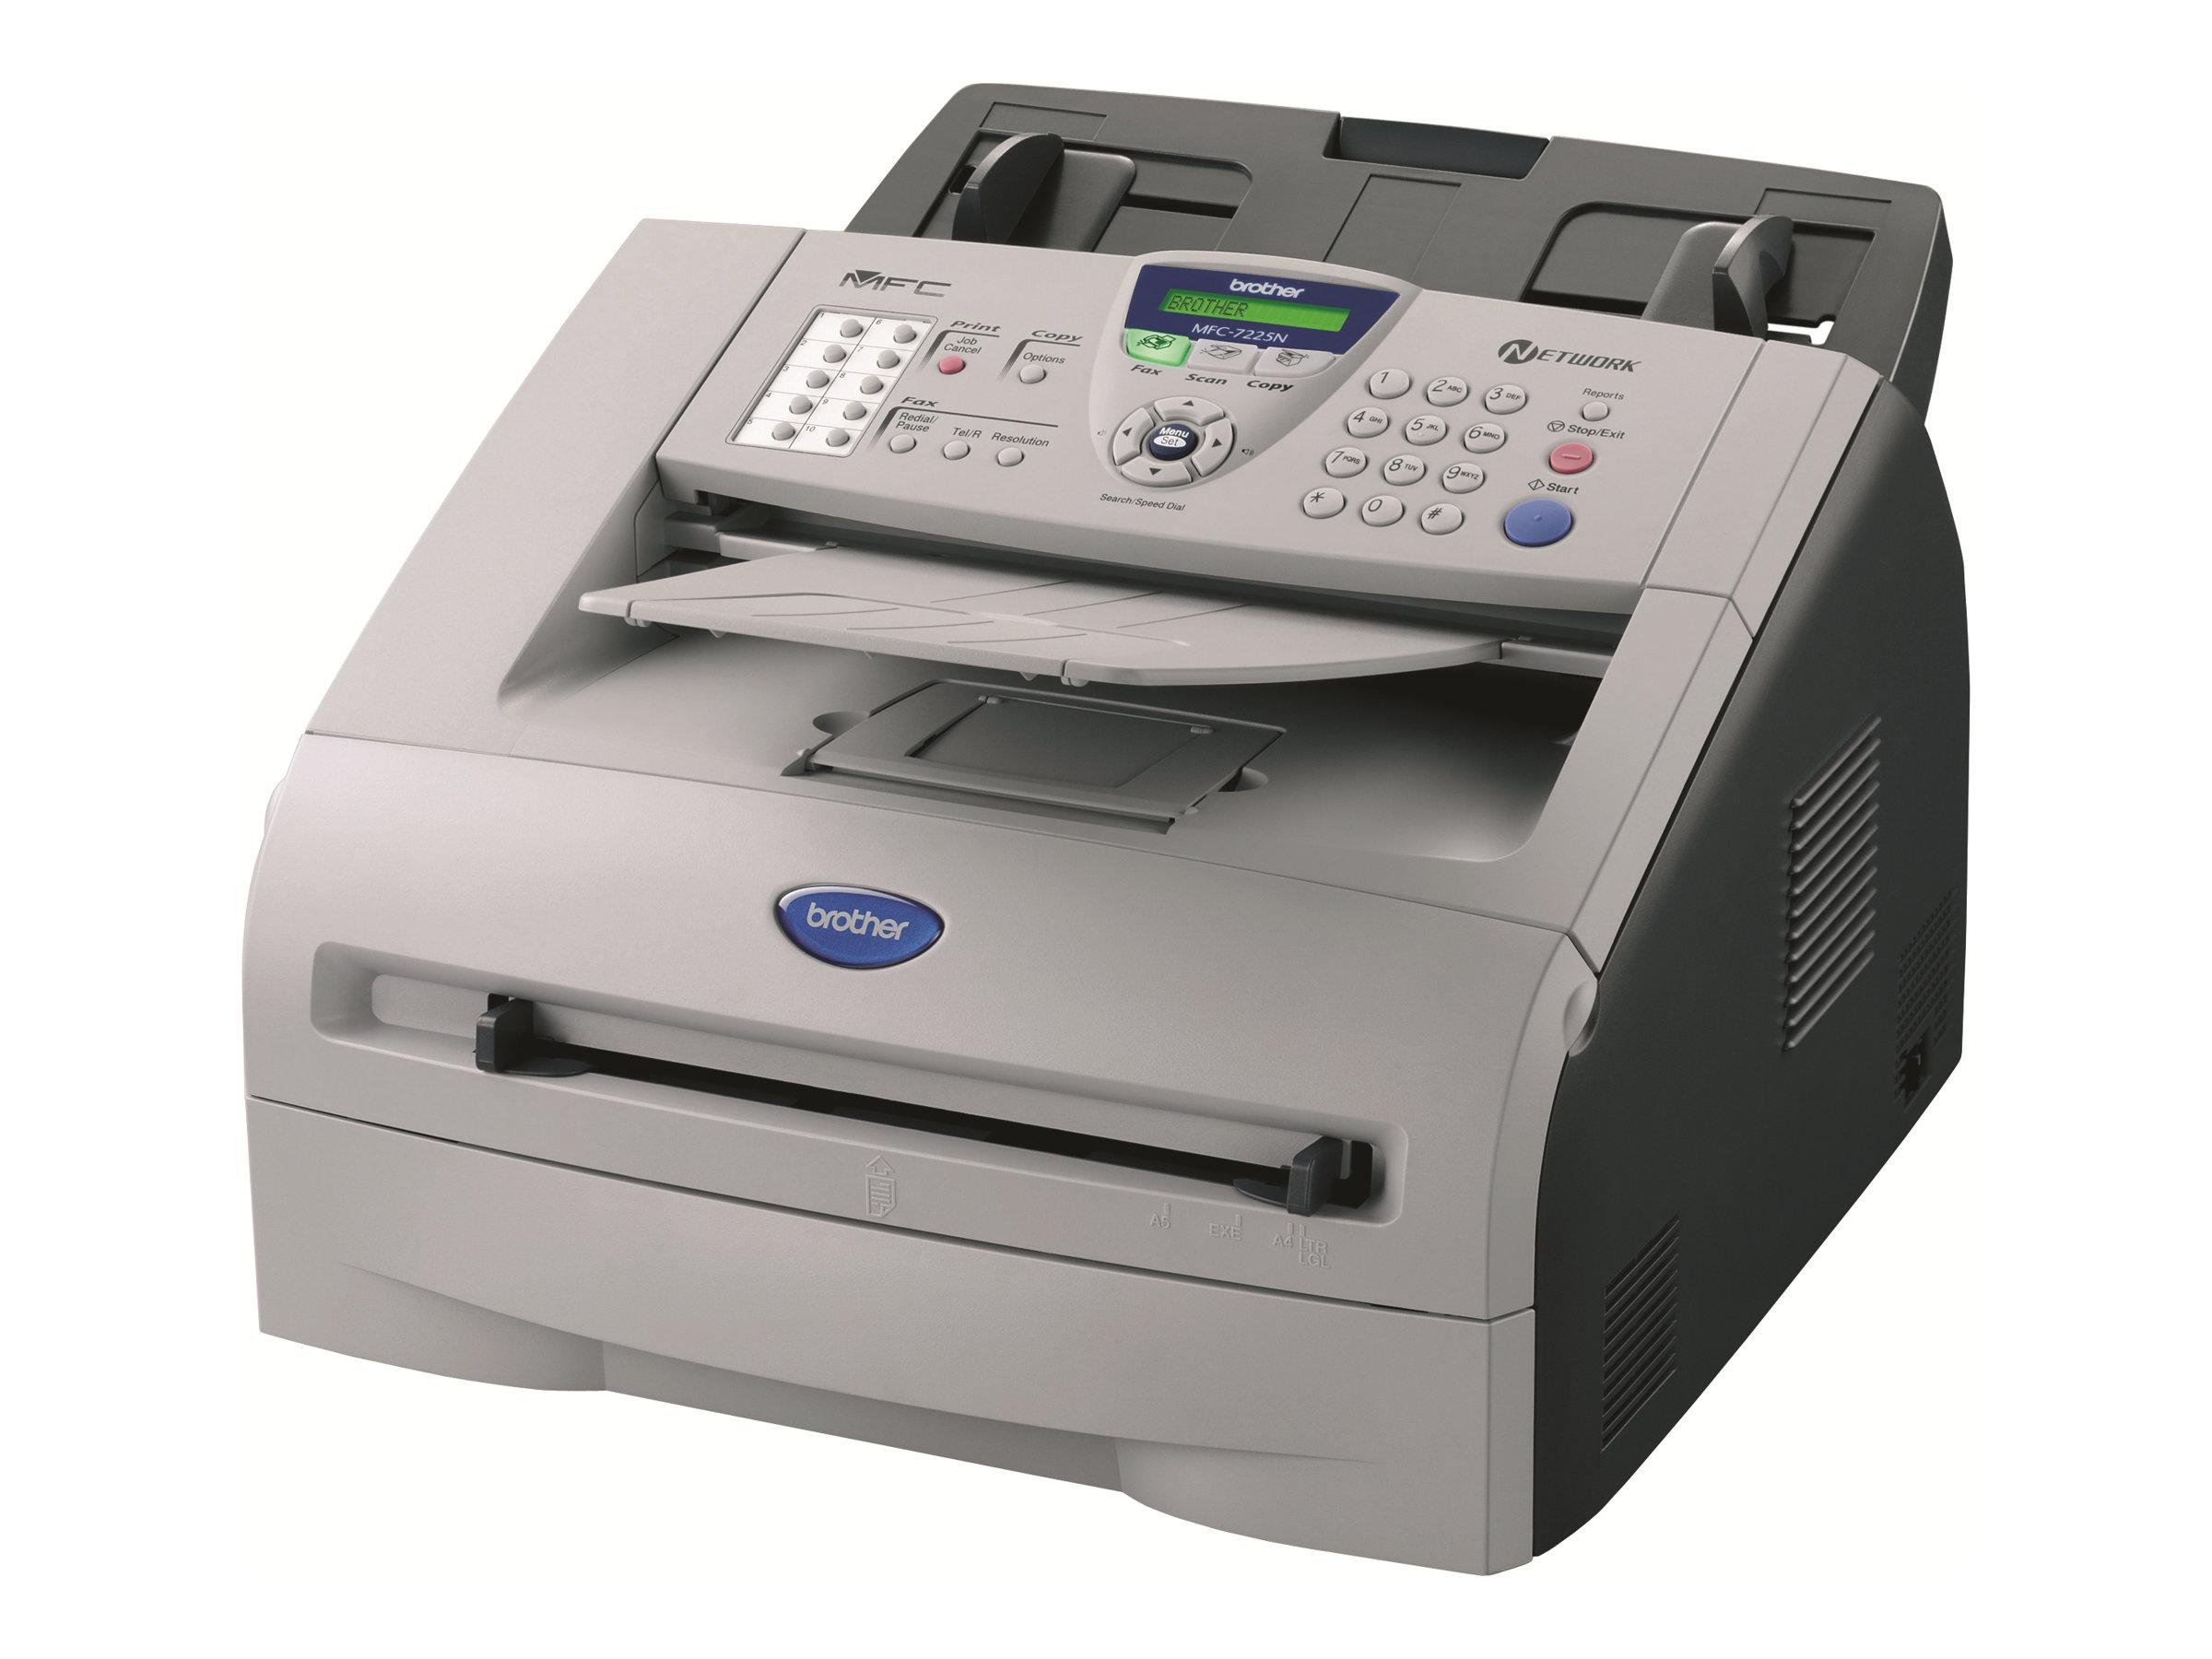 Brother MFC-7225n - imprimante multifonctions (Noir et blanc)